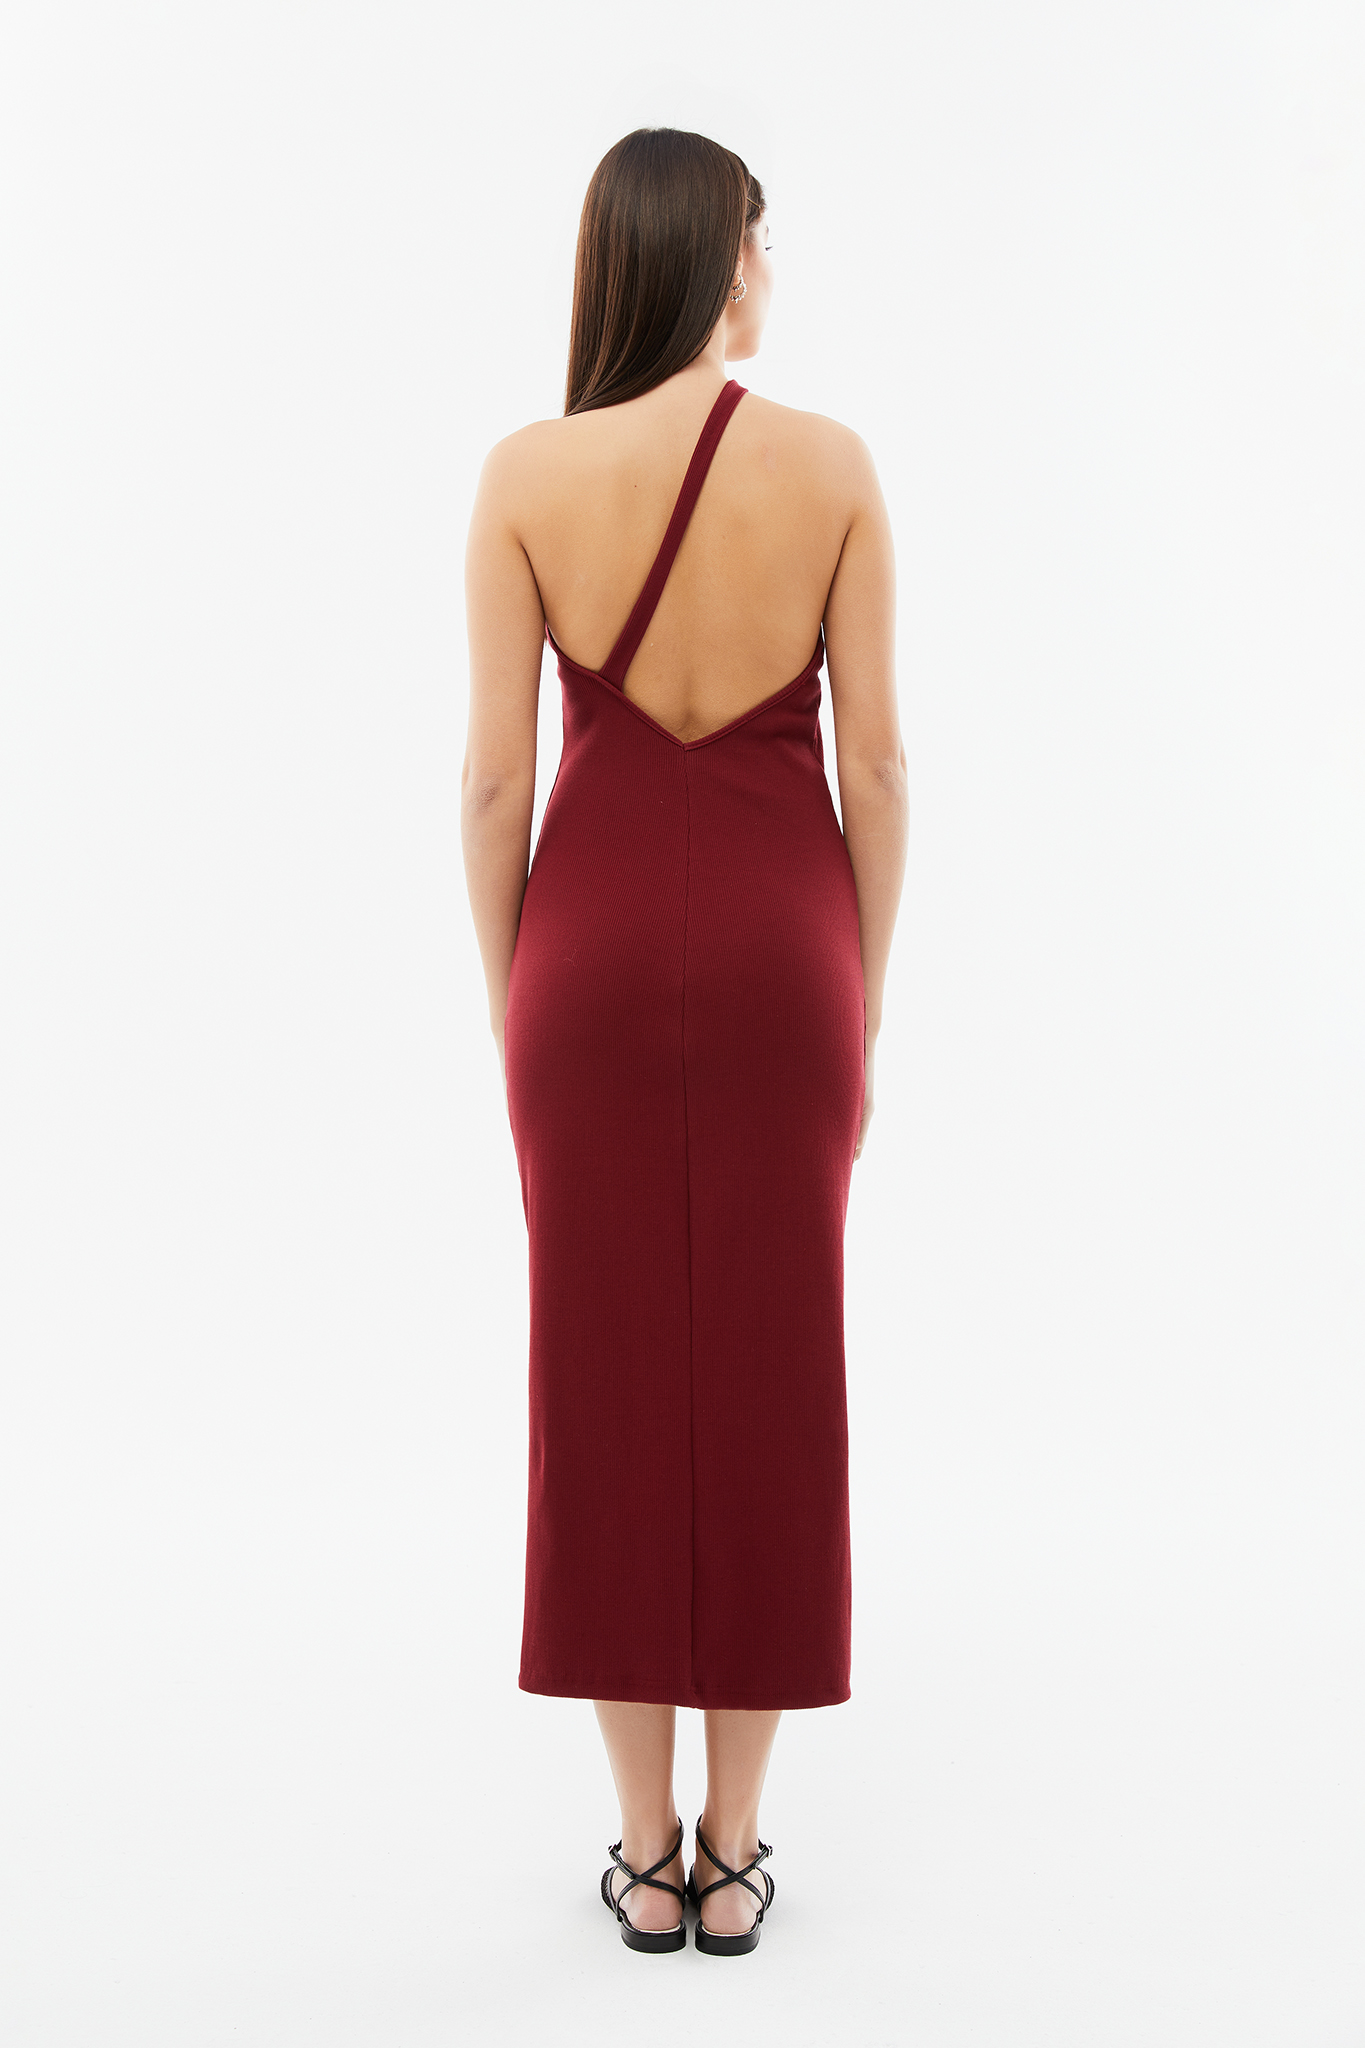 Blameyourdaze rib red dress